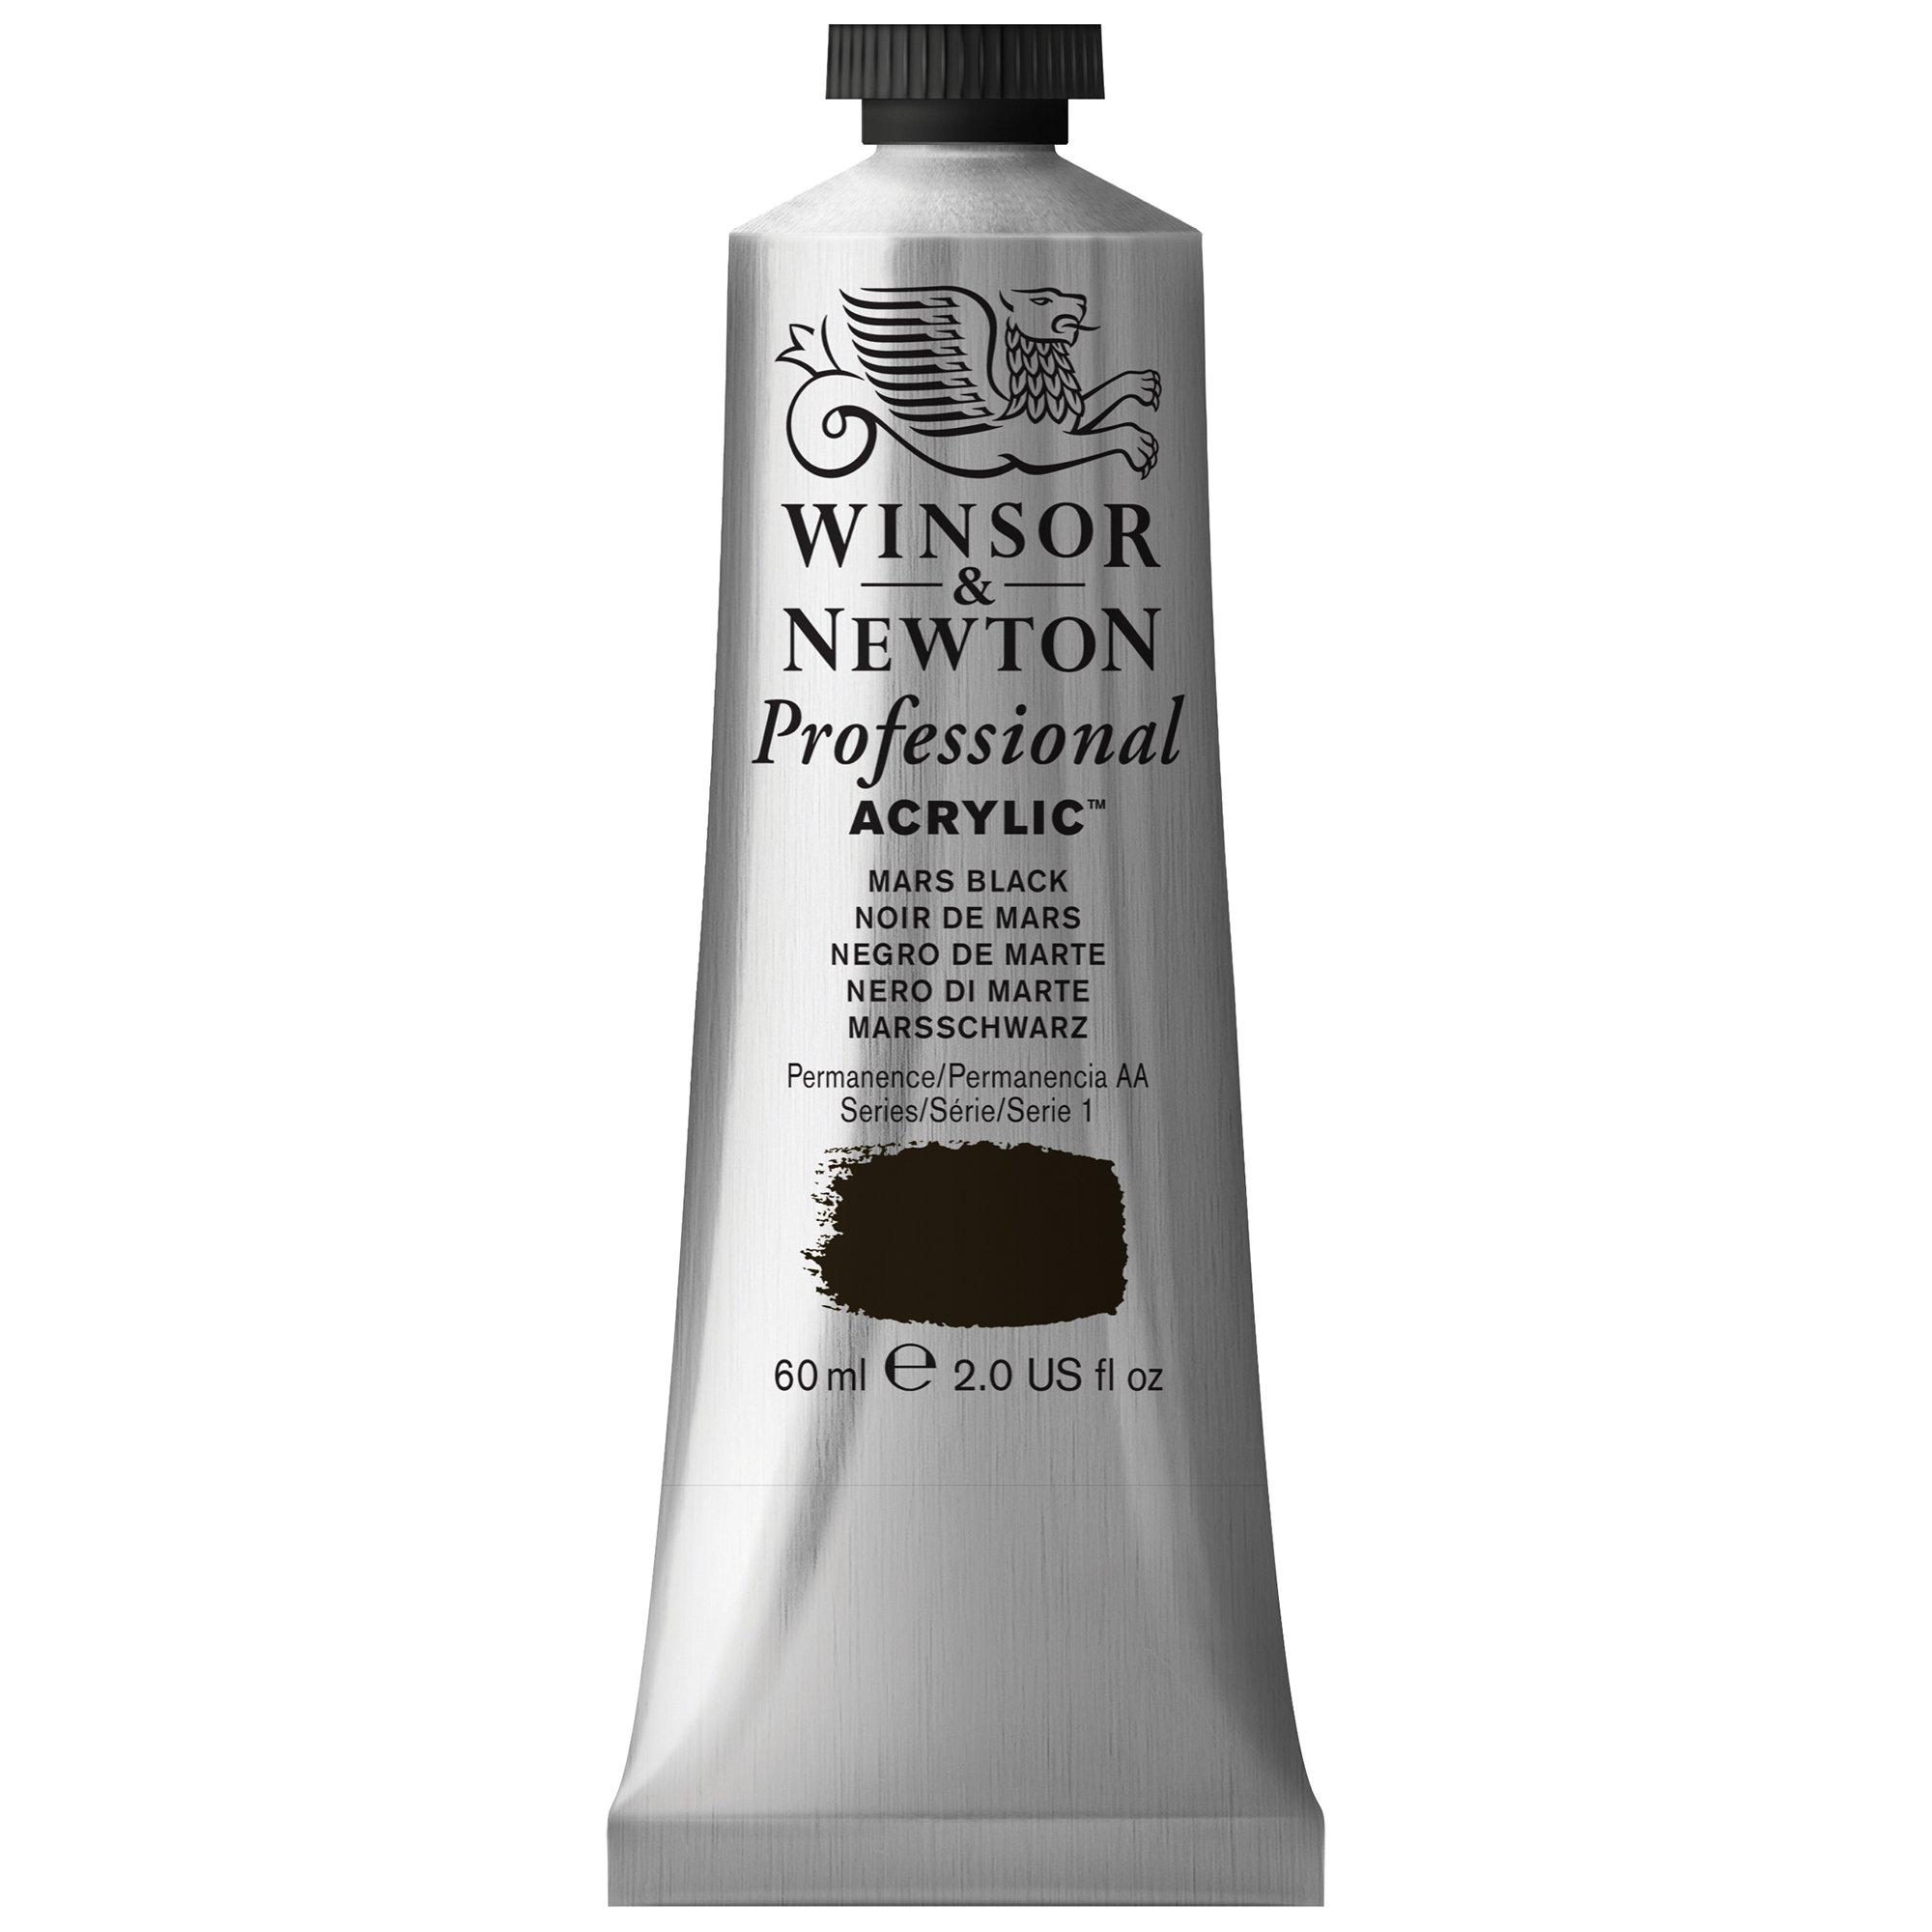 Winsor & Newton Professional Acrylic Color Paint, 60ml Tube, Mars Black